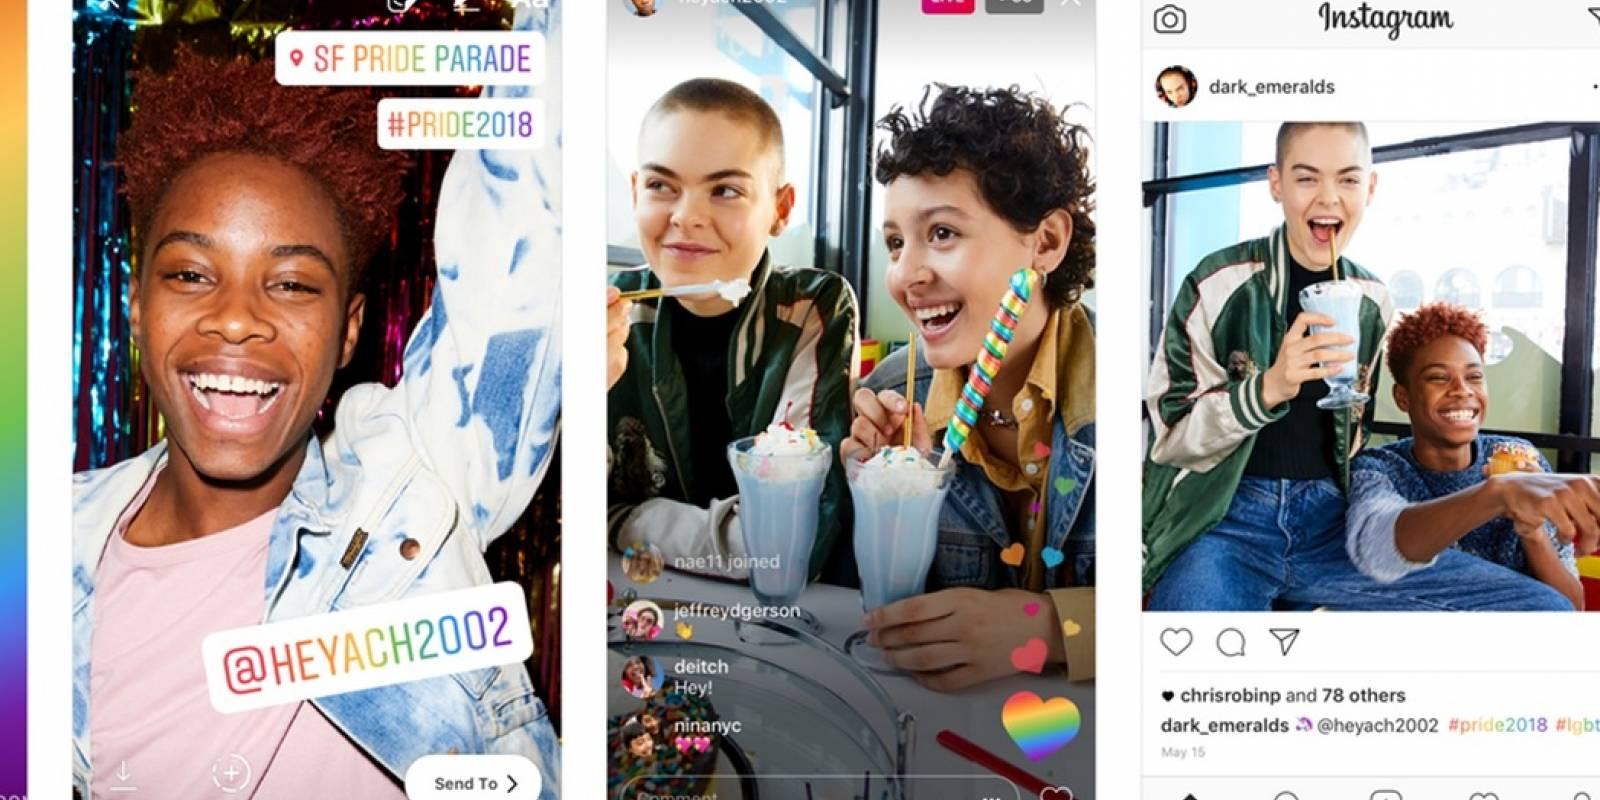 Instagram Pride